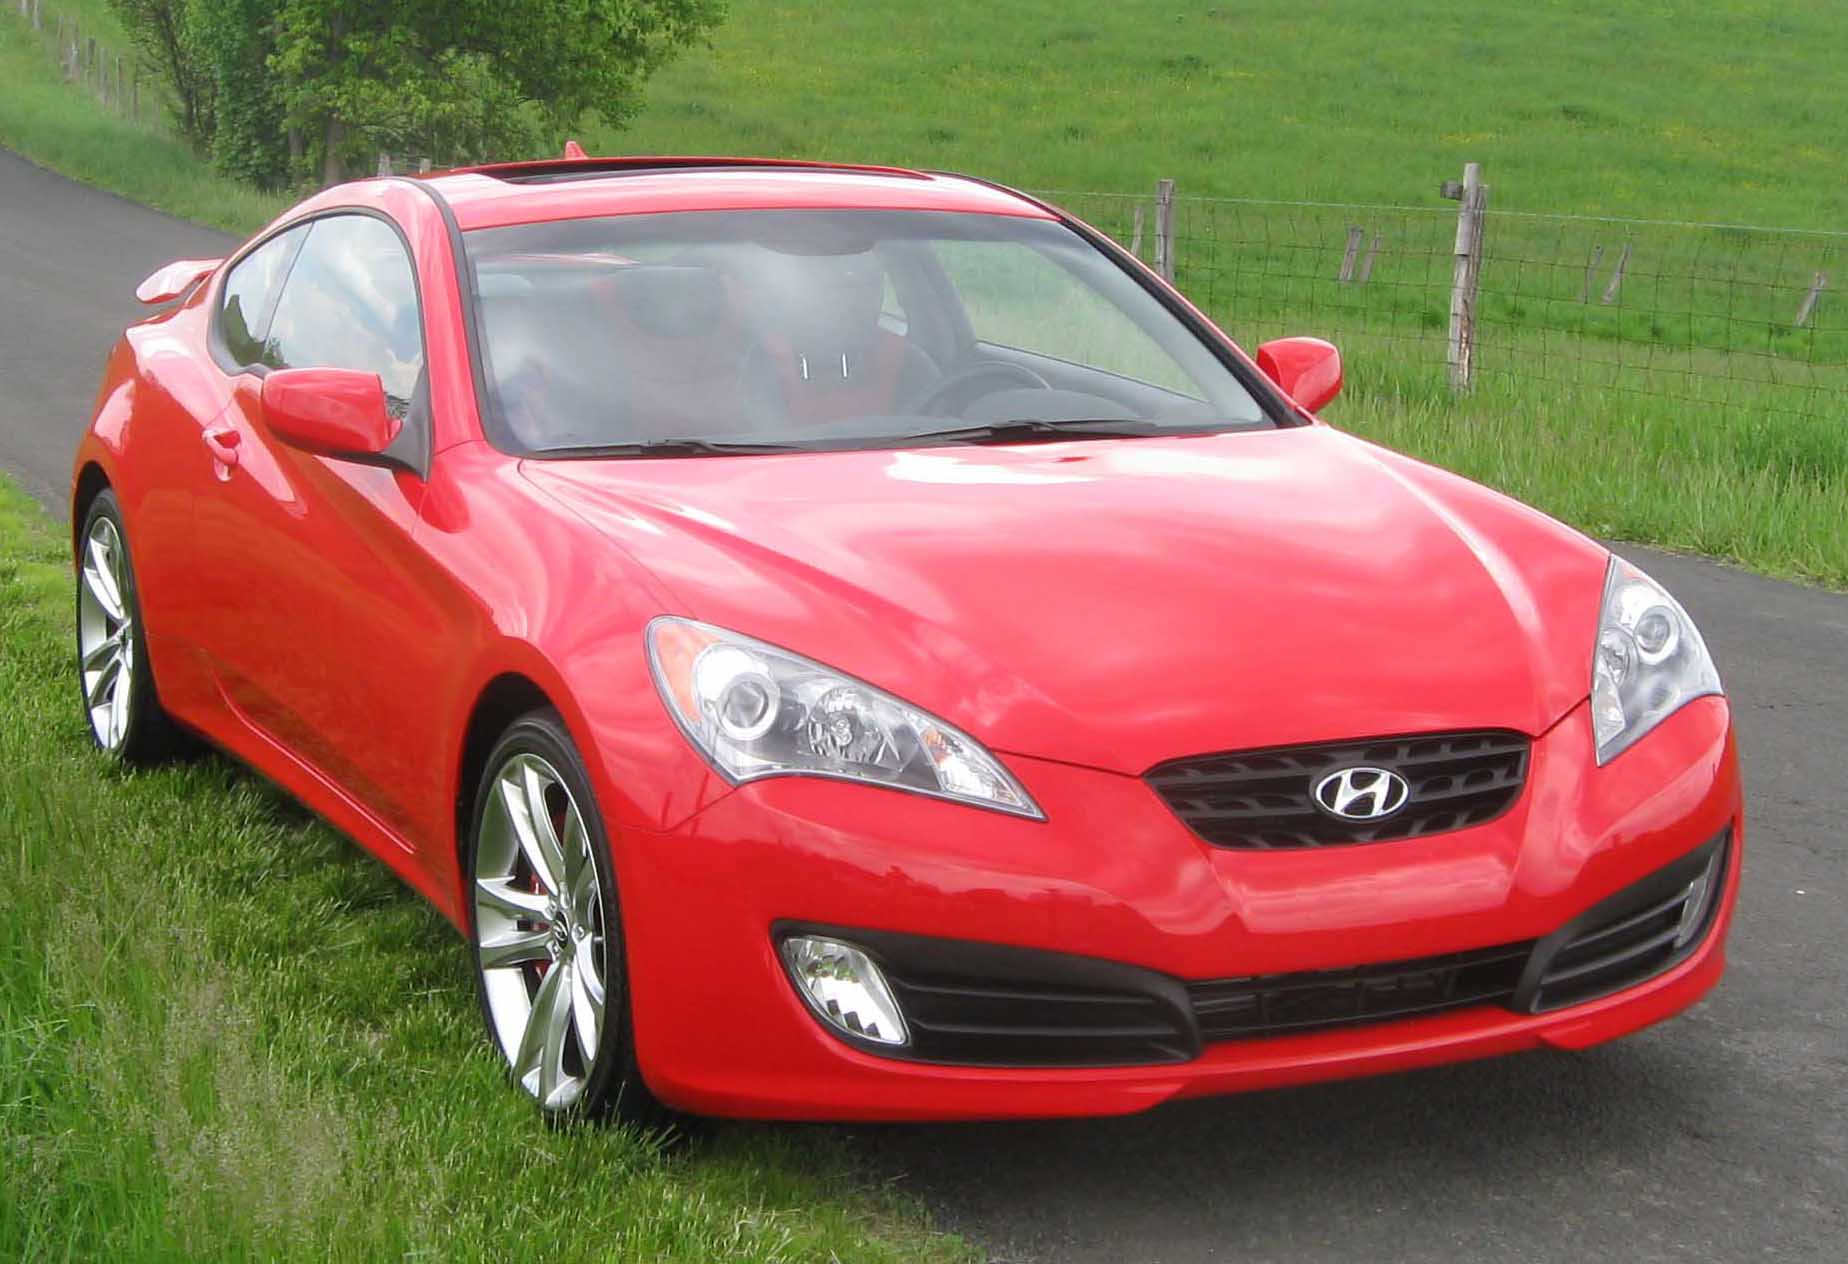 Hyundai Sports Car Philippines Price List